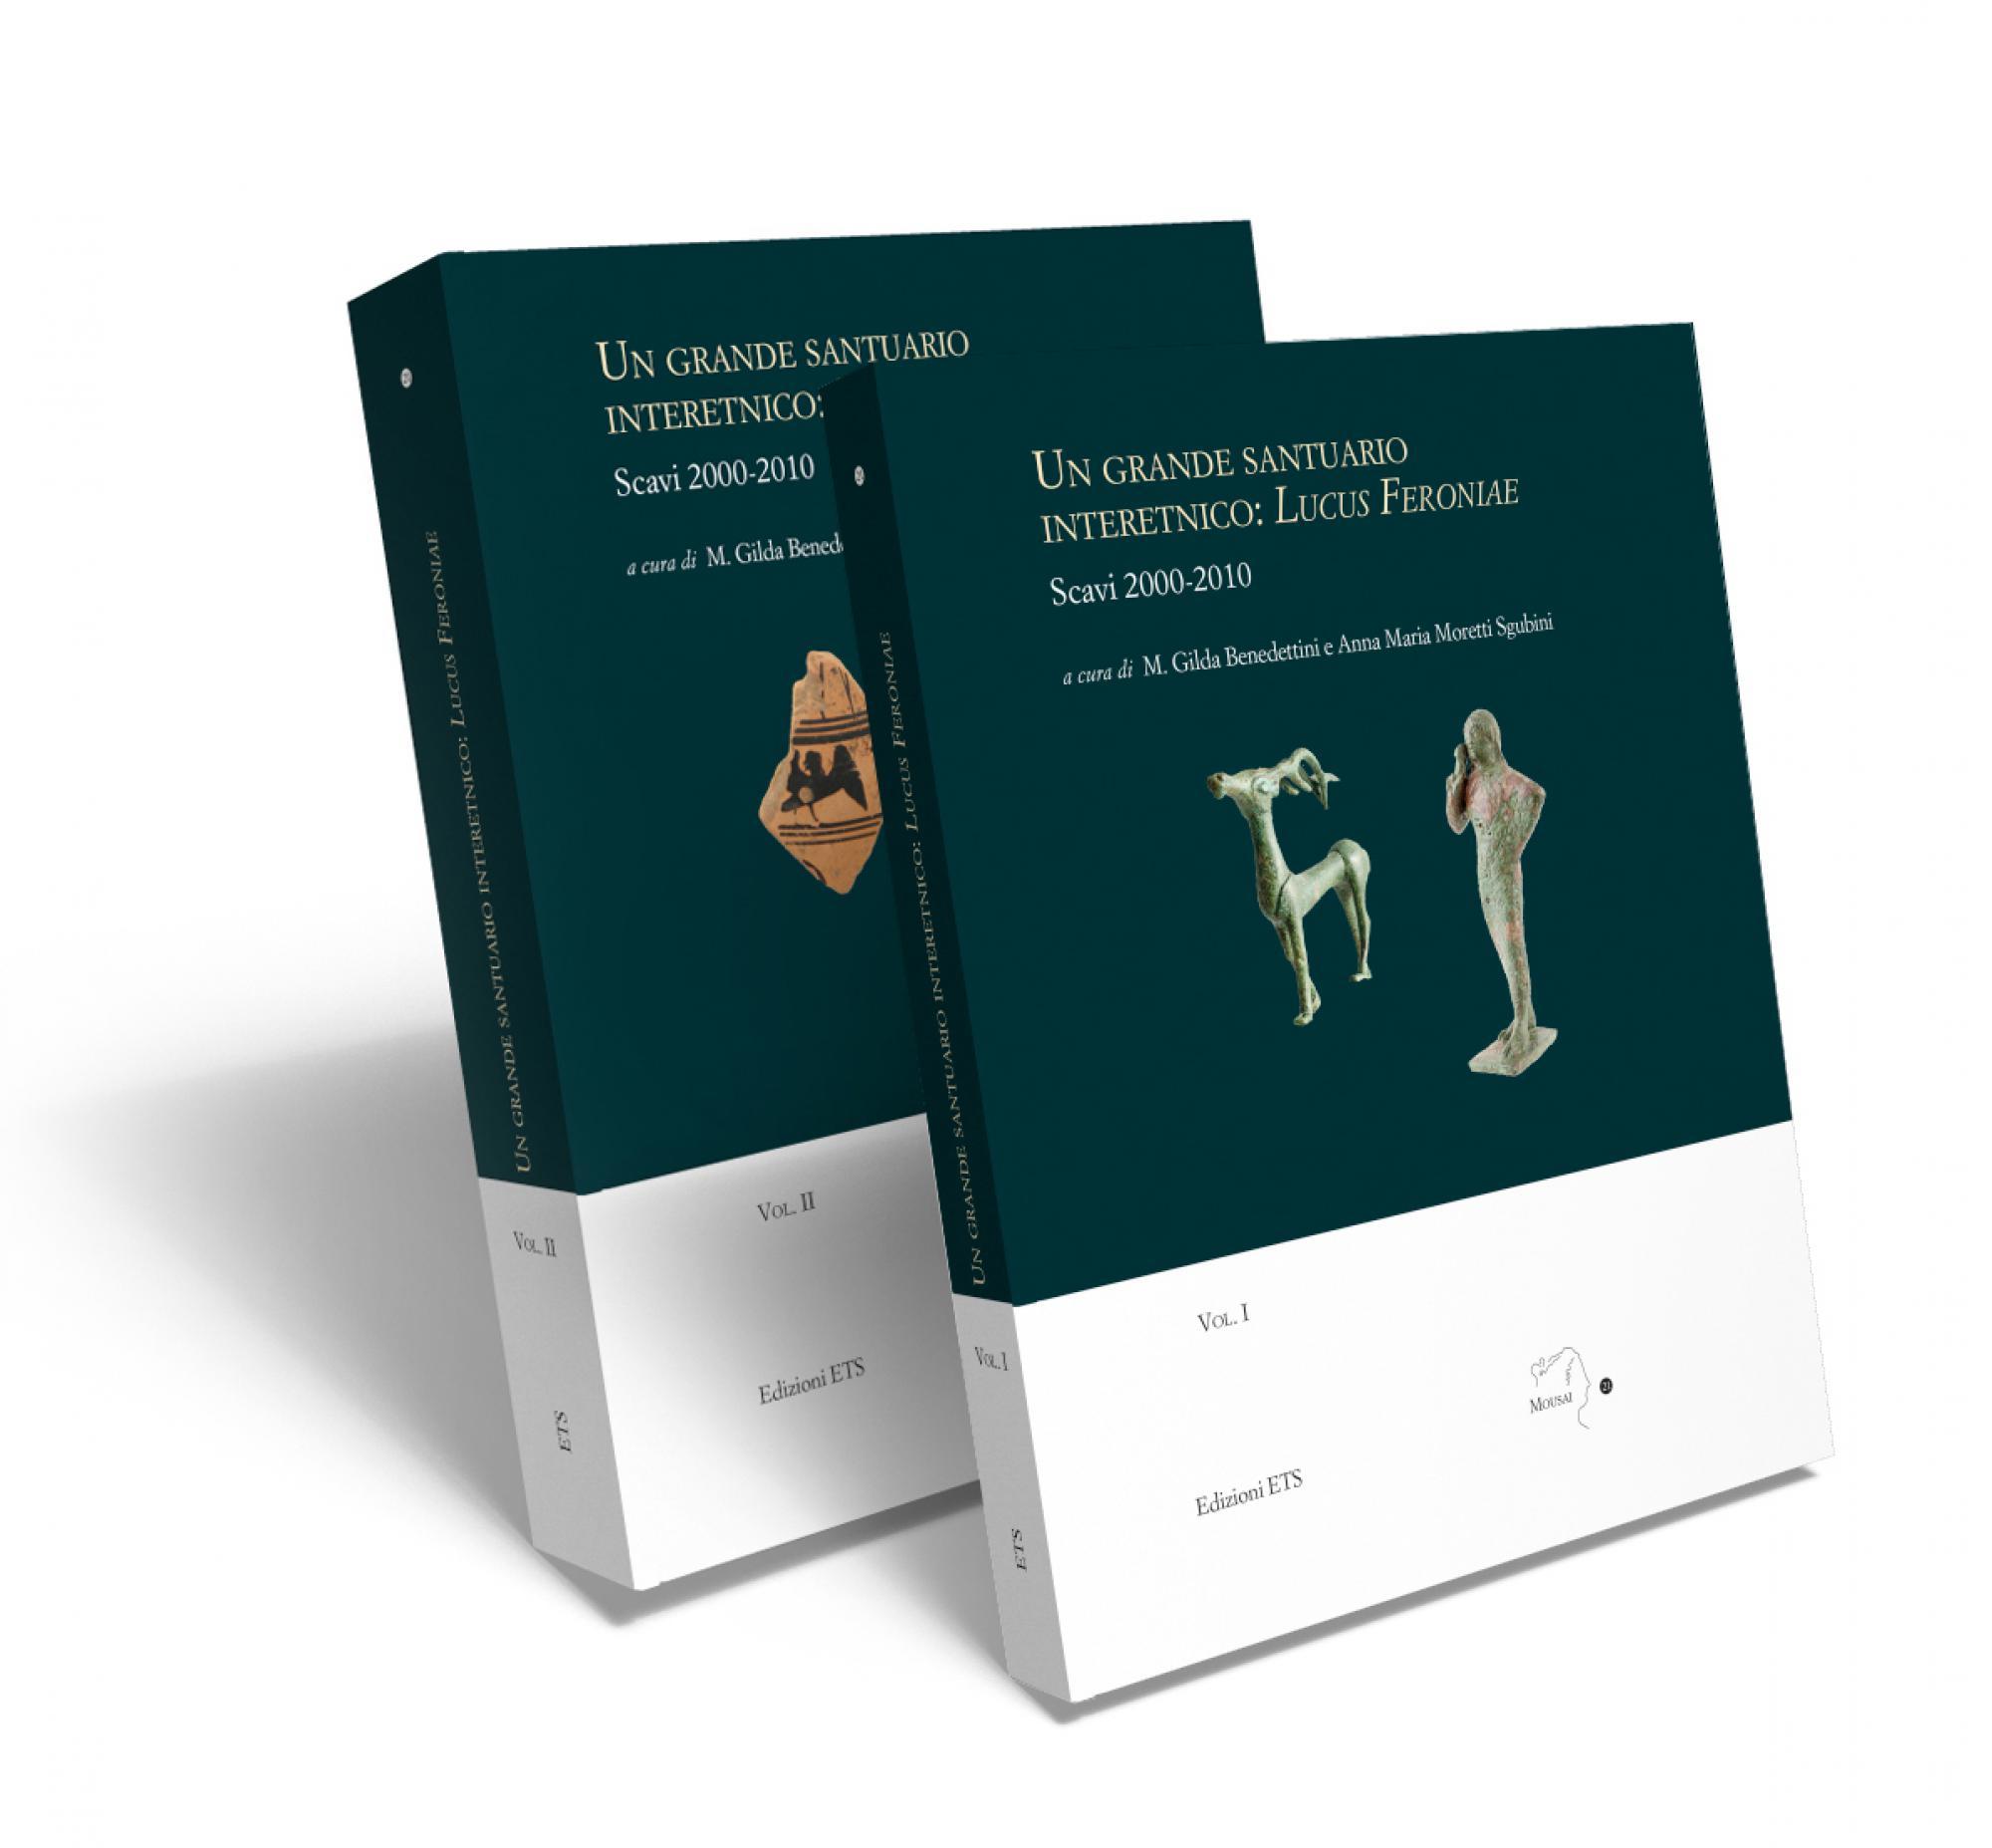 Un grande santuario interetnico: Lucus Feroniae.Scavi 2000-2010 - Vol I e II